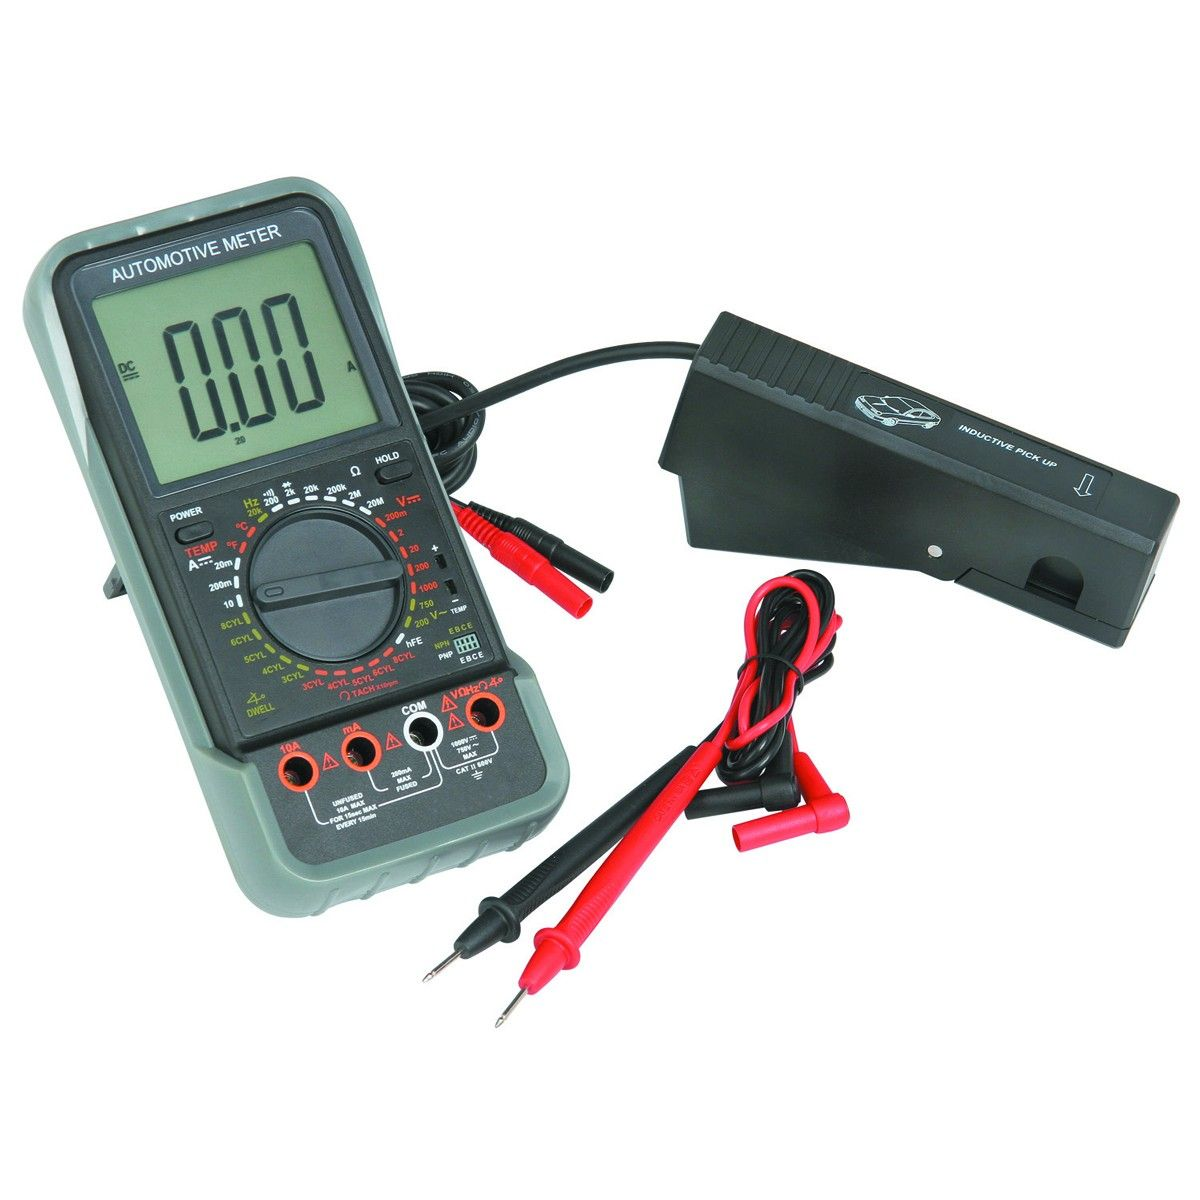 Centech 95670 lcd automotive multimeter with tachometer